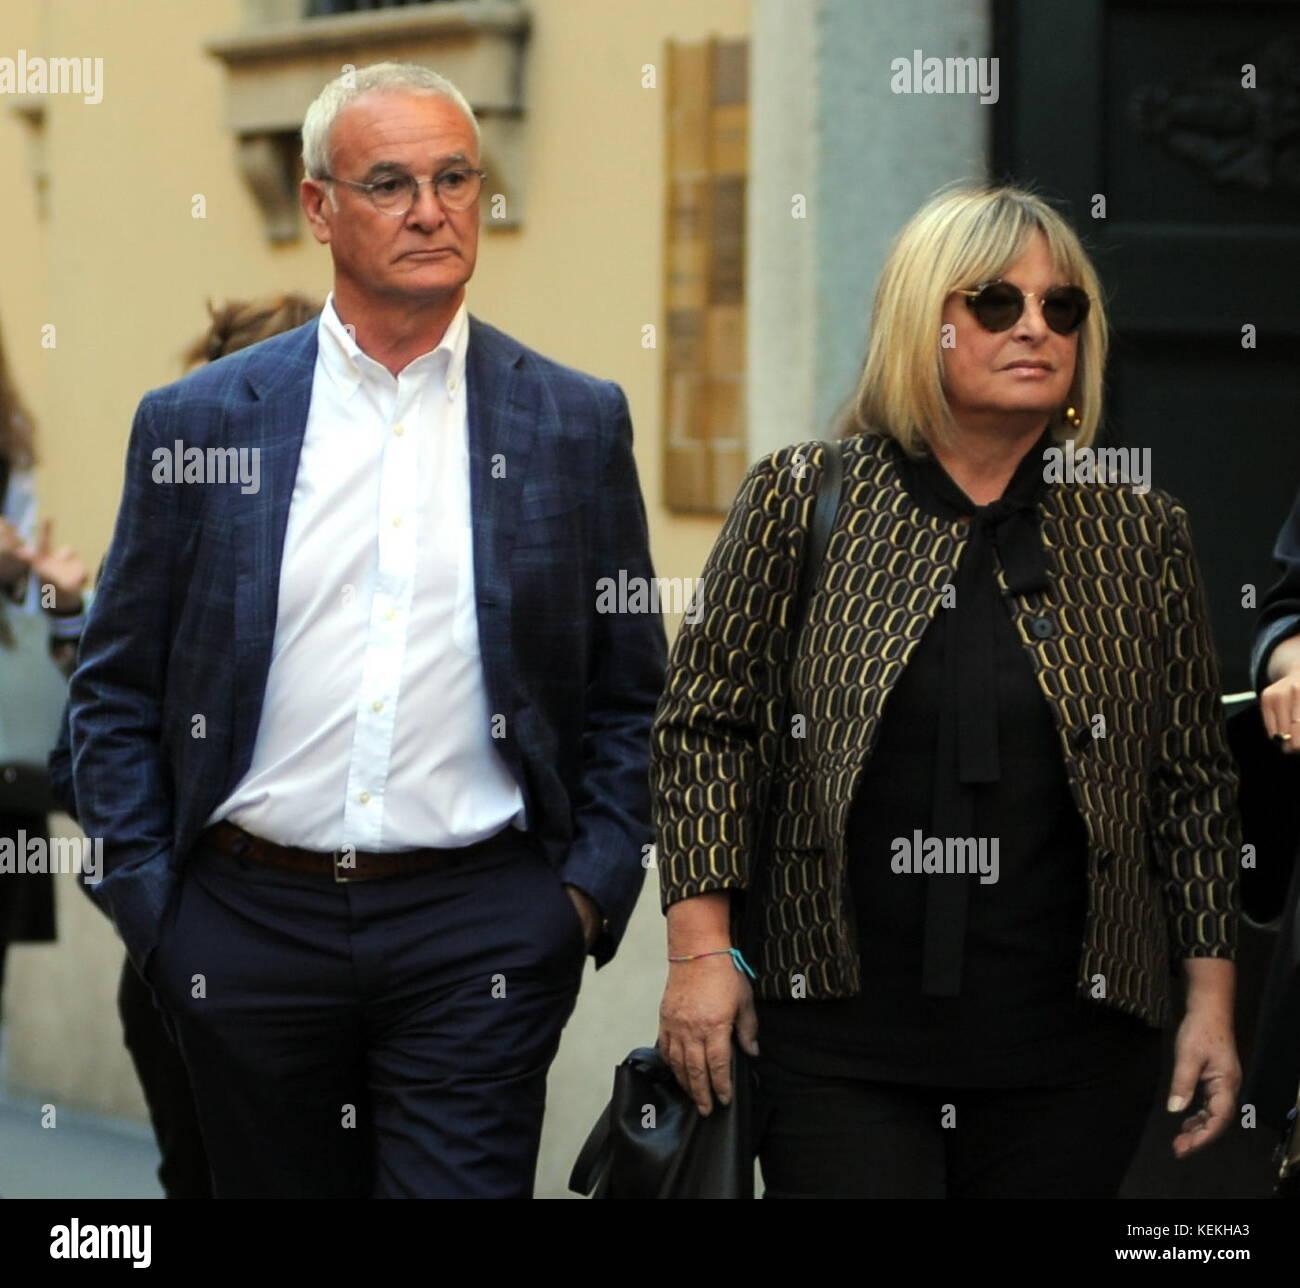 Rosanna Ranieri High Resolution Stock Photography and ...